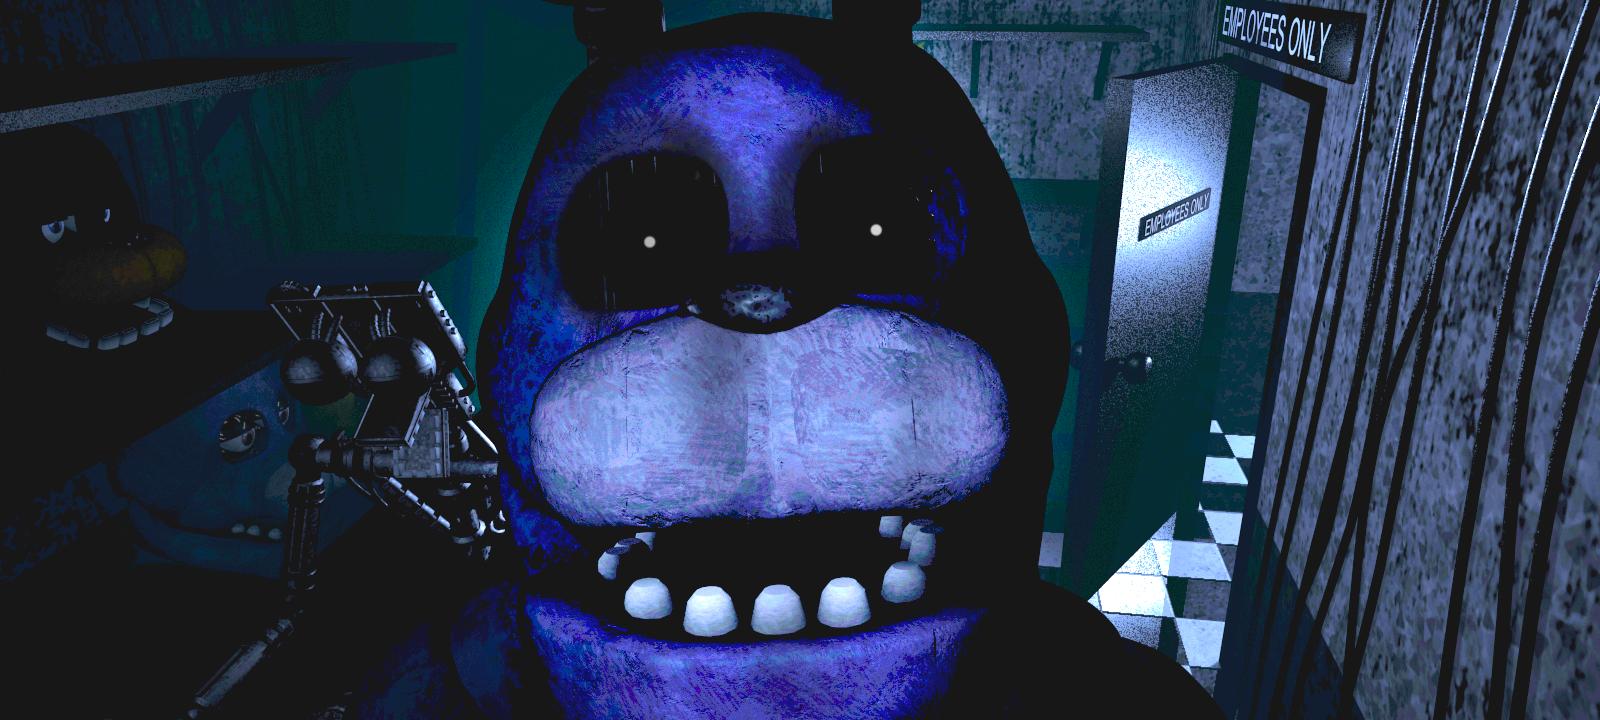 Another Scary Bonnie by Sean by DarkWarriorPincess on DeviantArt